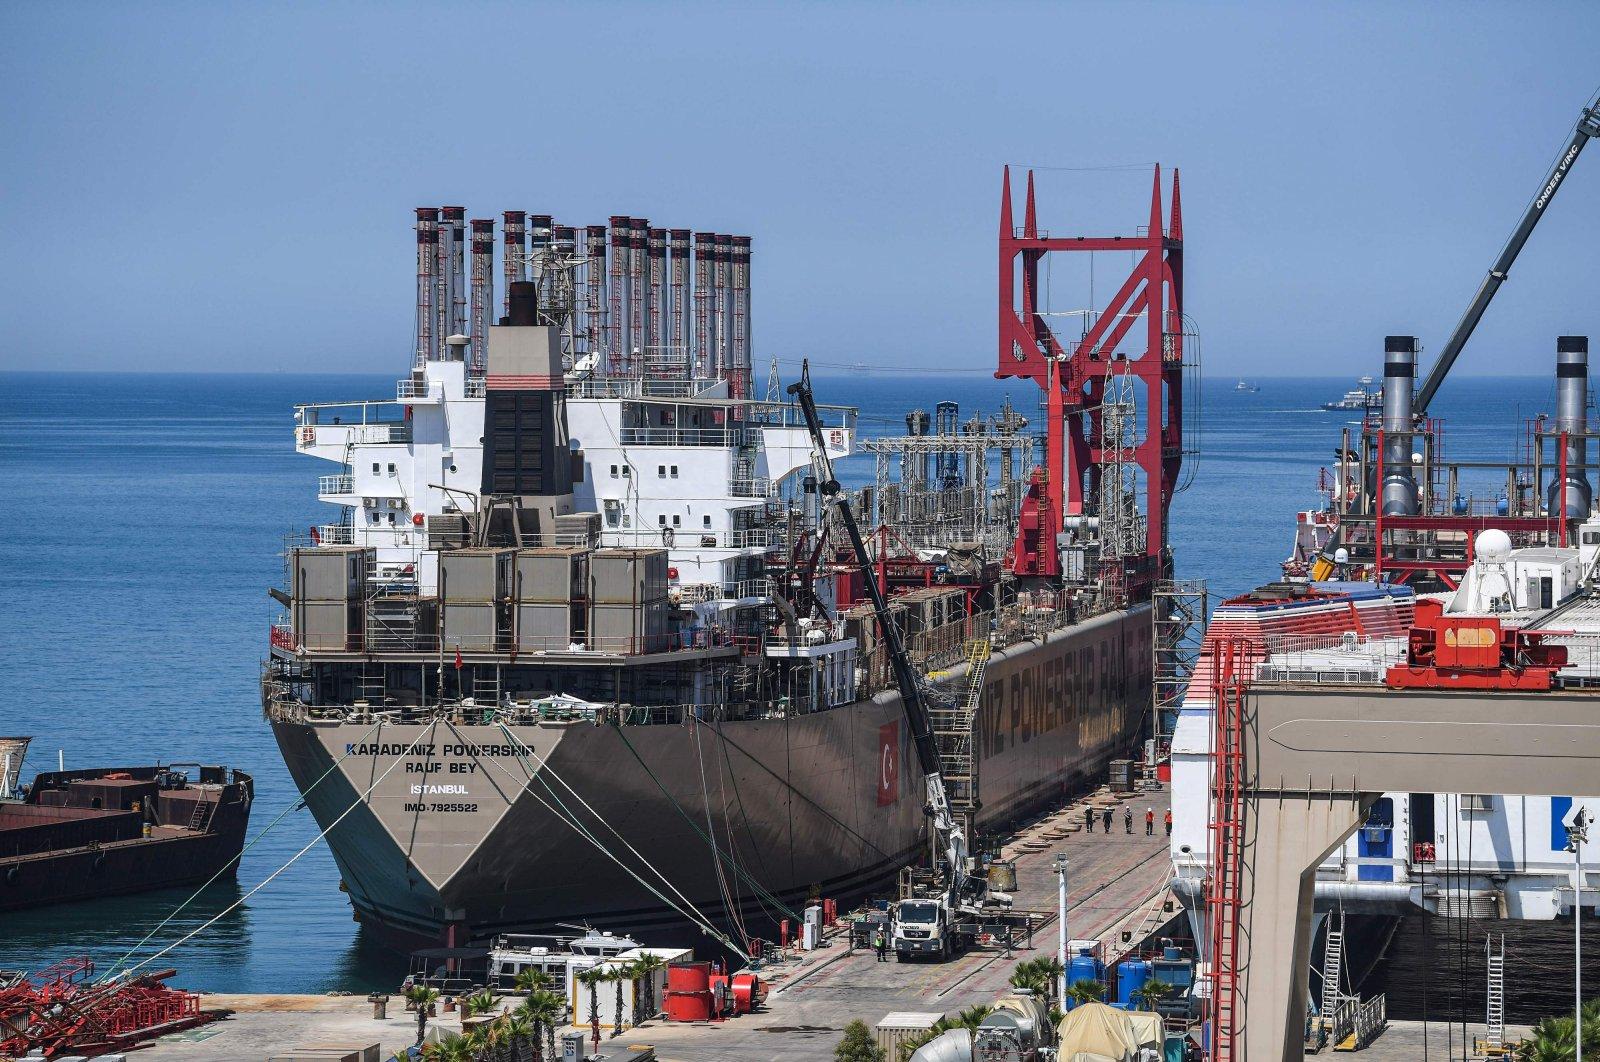 Karadeniz Holding's Raif Bey power ship docked in a shipyard of Altınova district, Yalova, June 16, 2020. (AFP Photo)